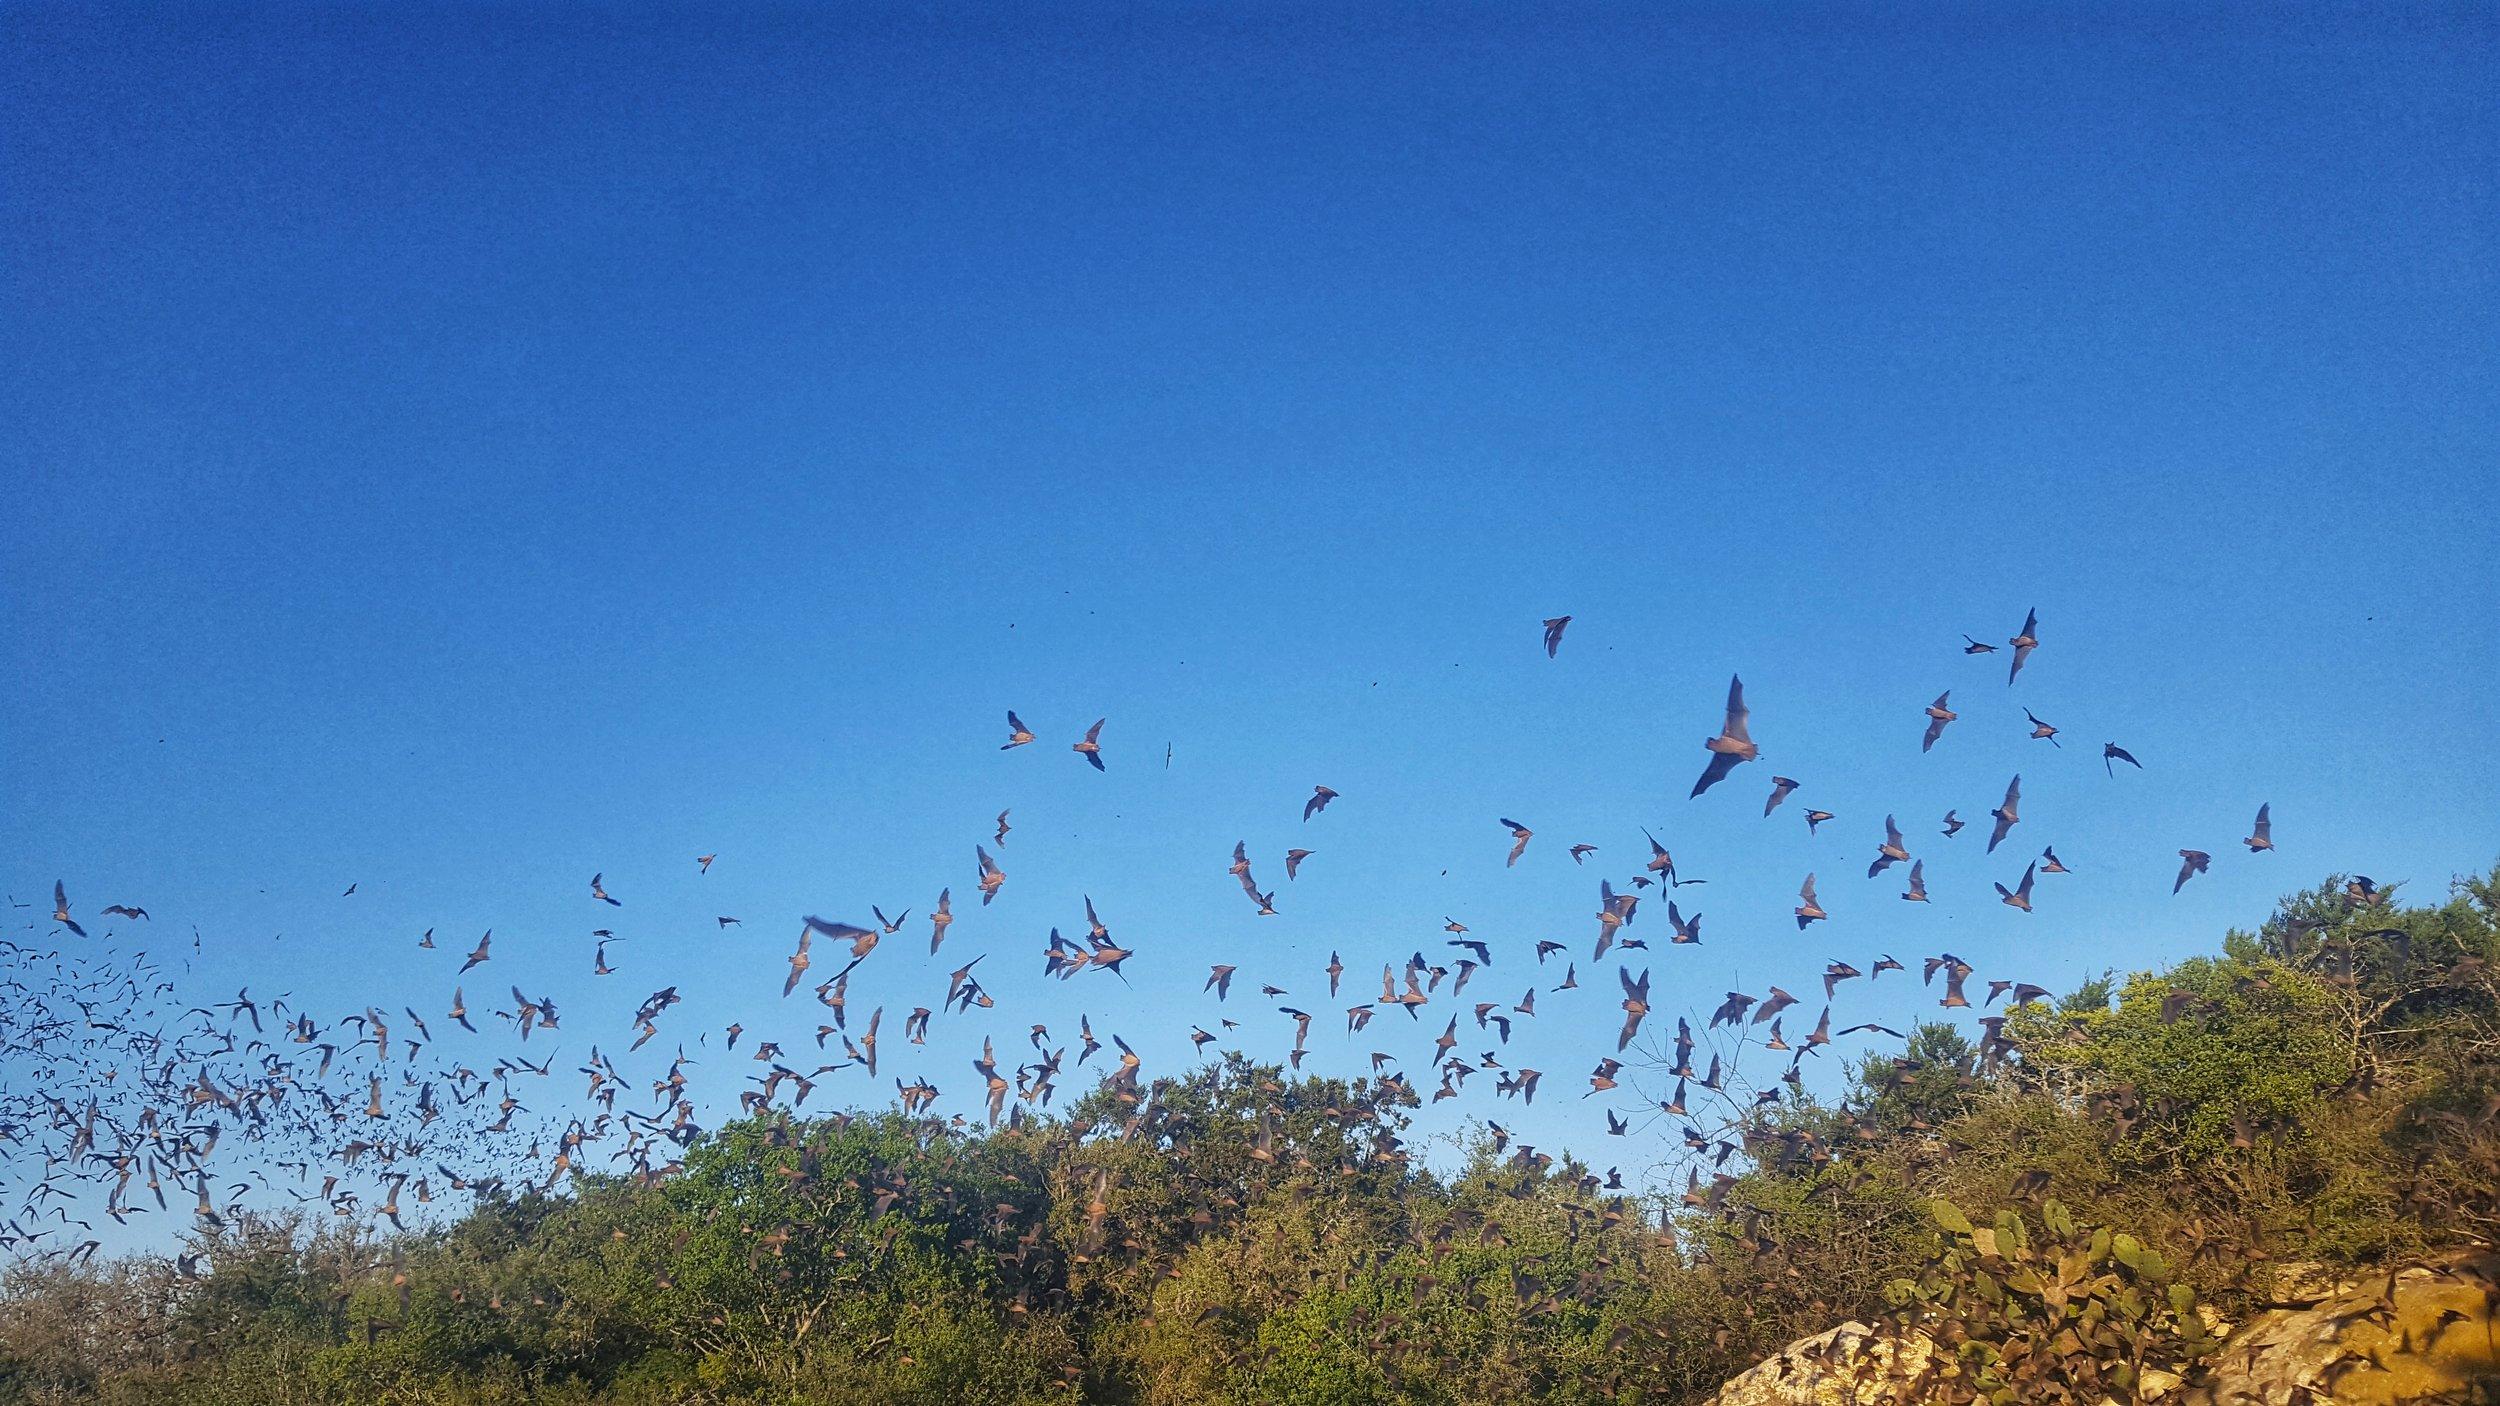 Mexican Free-Tail bats exiting the Stuart Bat Cave at dusk.